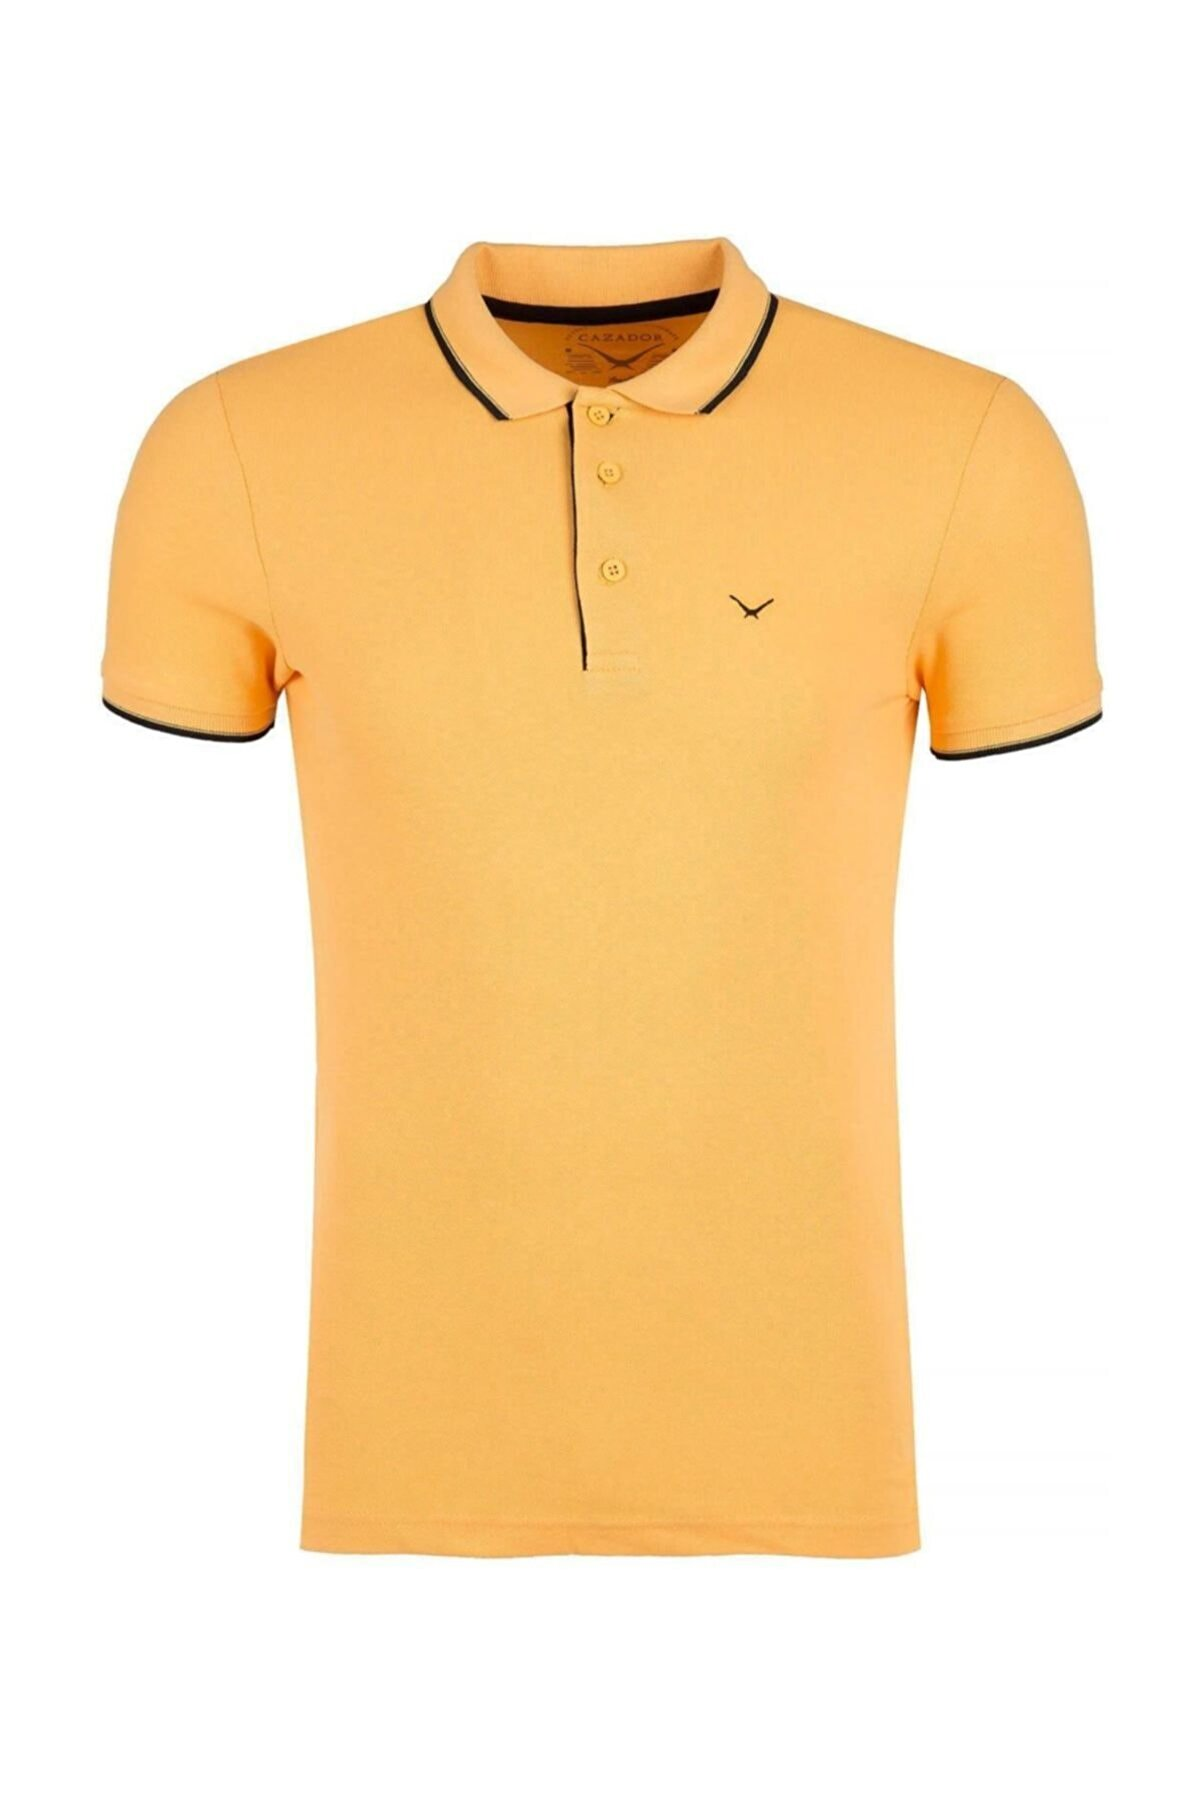 Cazador Erkek Hardal T-Shirt - Cdr4614-19YCEEOM4614